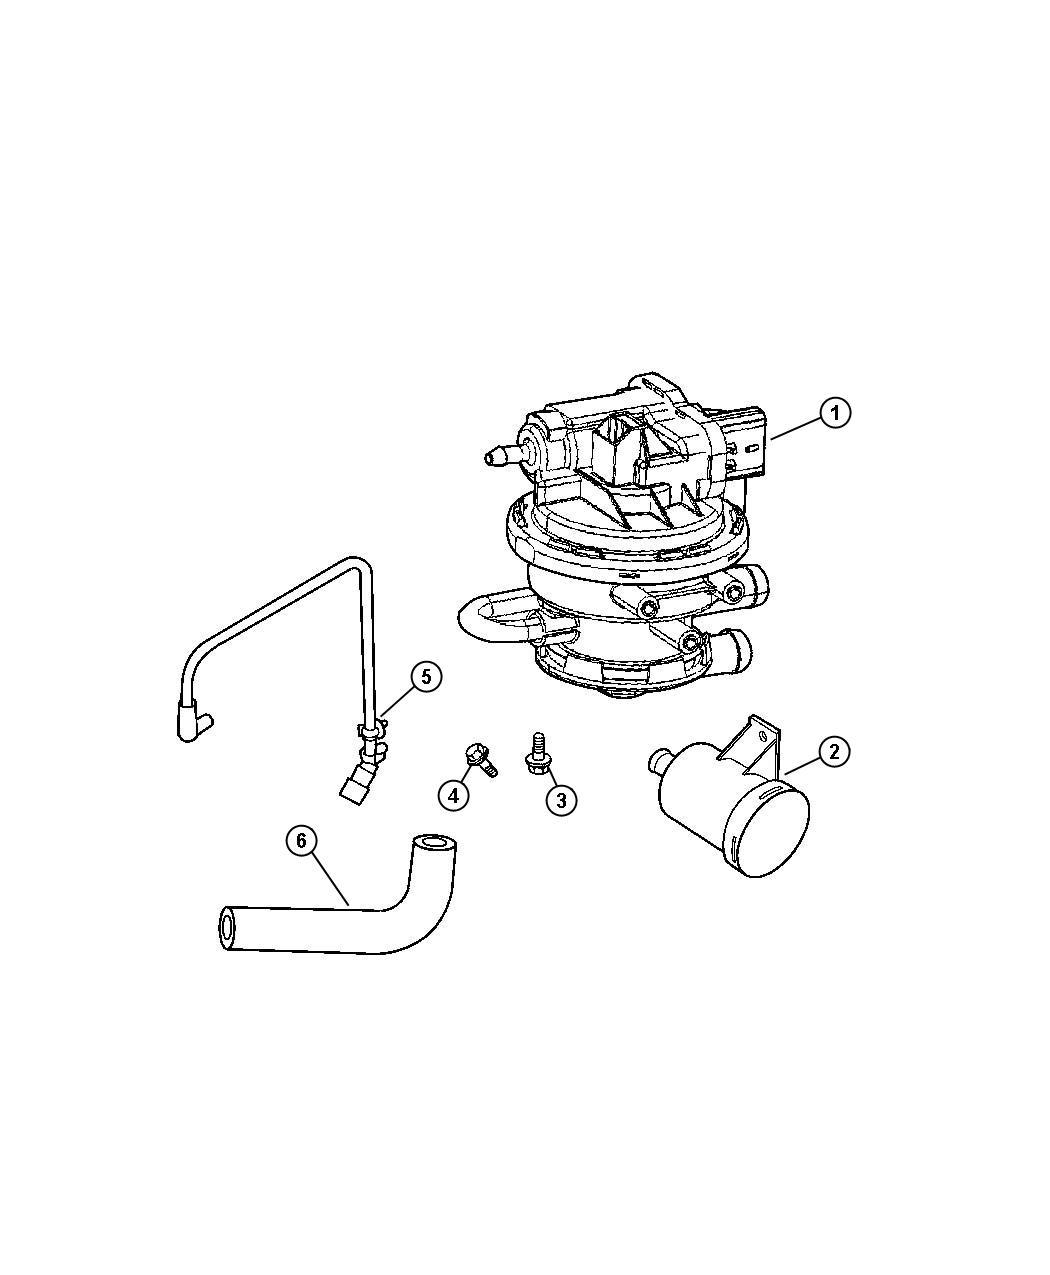 Jeep Wrangler Pump Leak Detection Evc